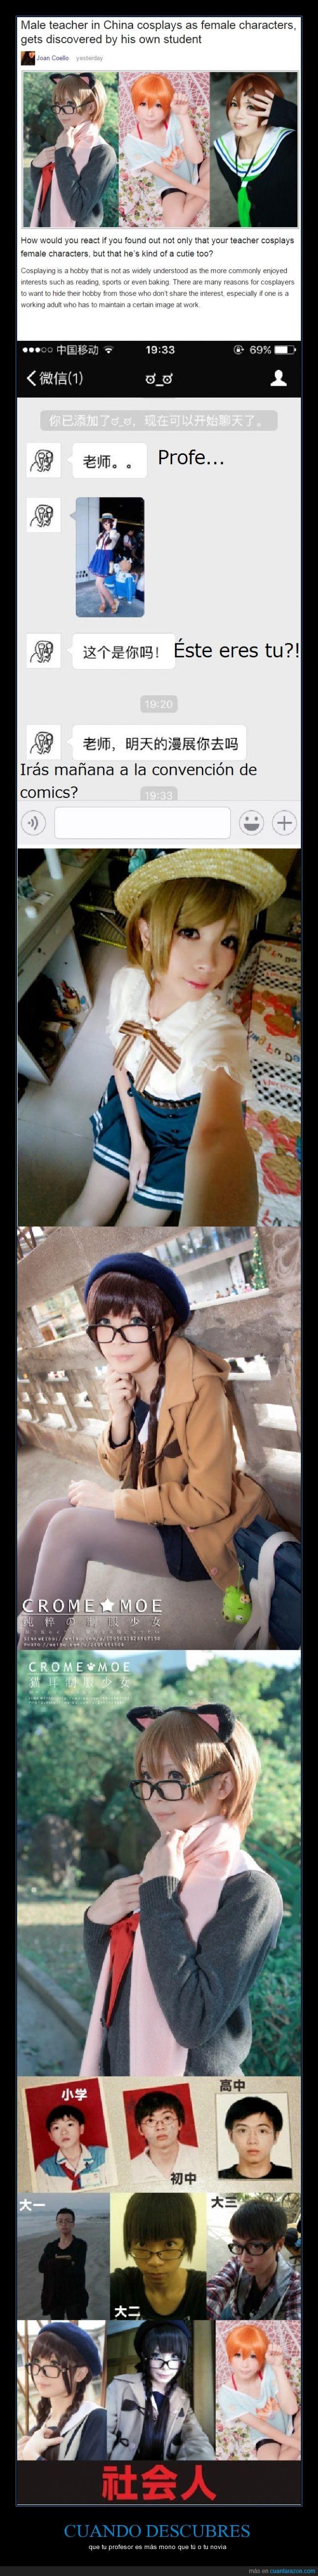 alumno,anime,asiatico,China,cosplay,kawaii pero chino,modelo,mono,Profesor,Trap,travestir